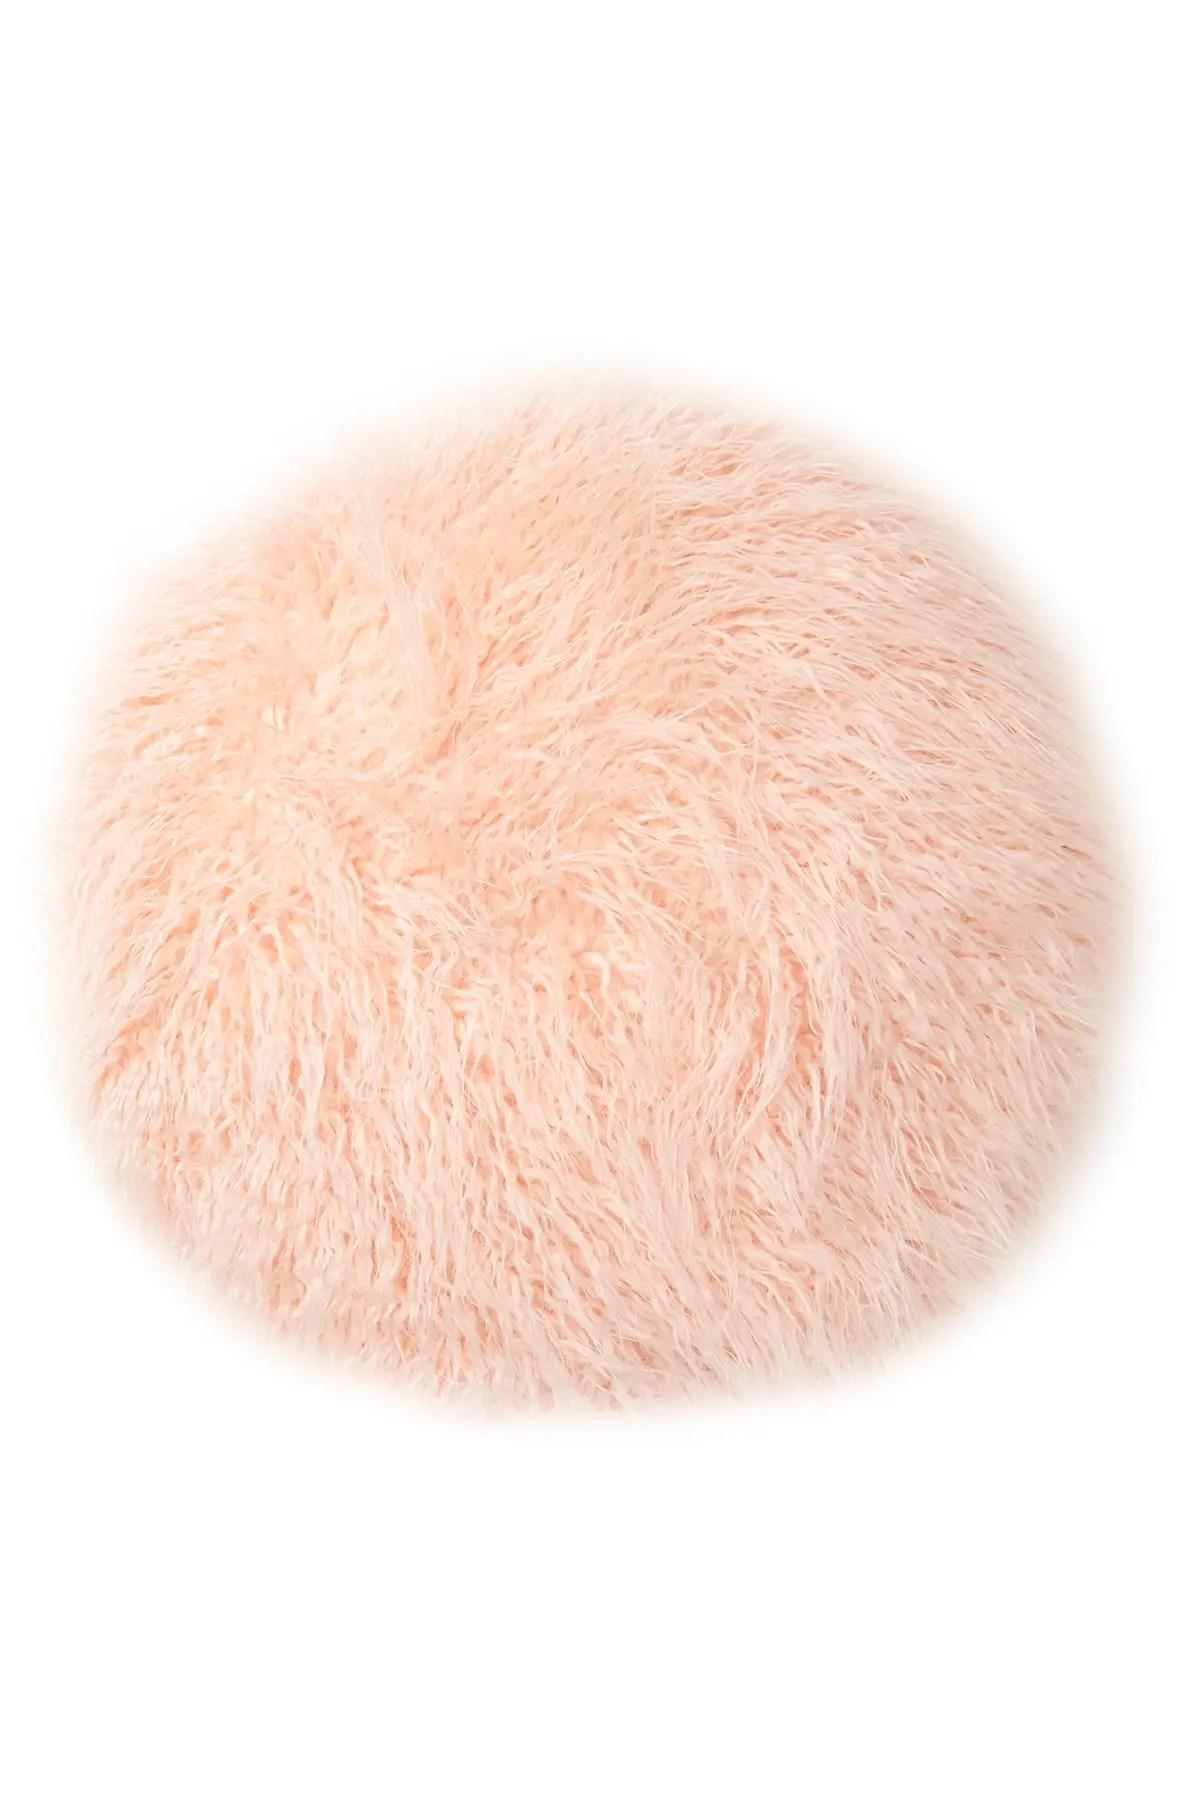 nordstrom rack flokati faux fur round